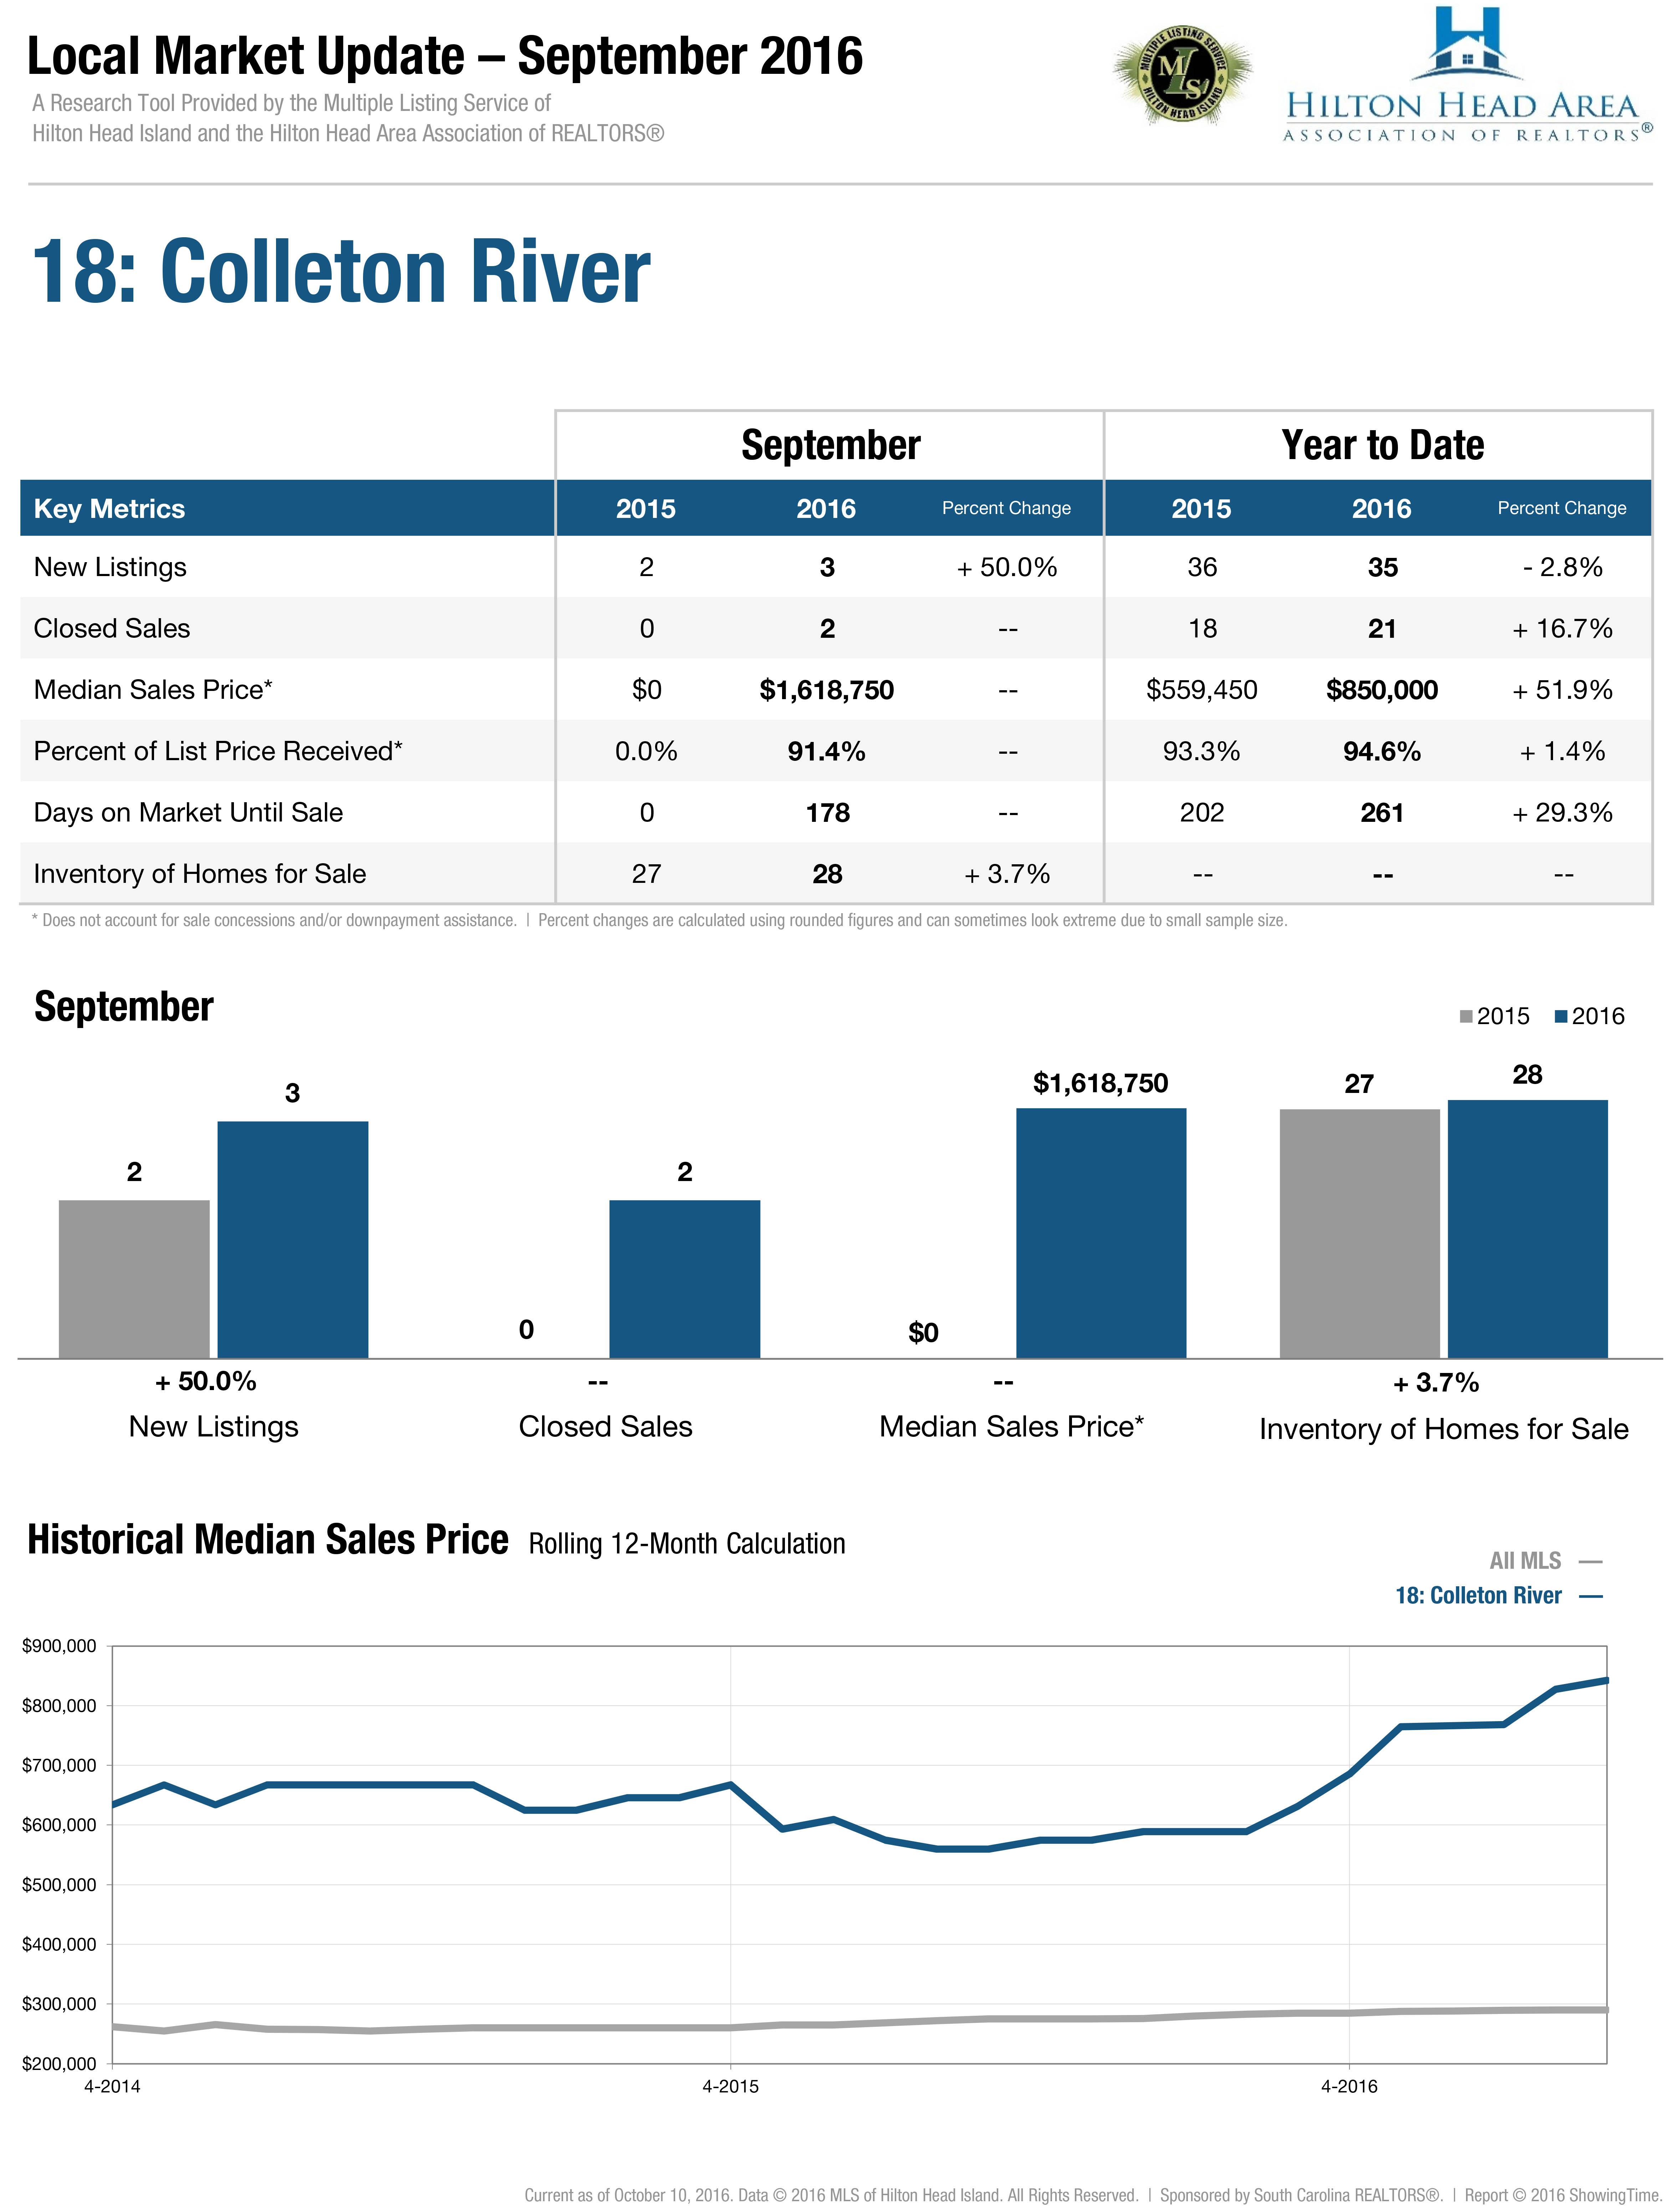 18: Colleton River